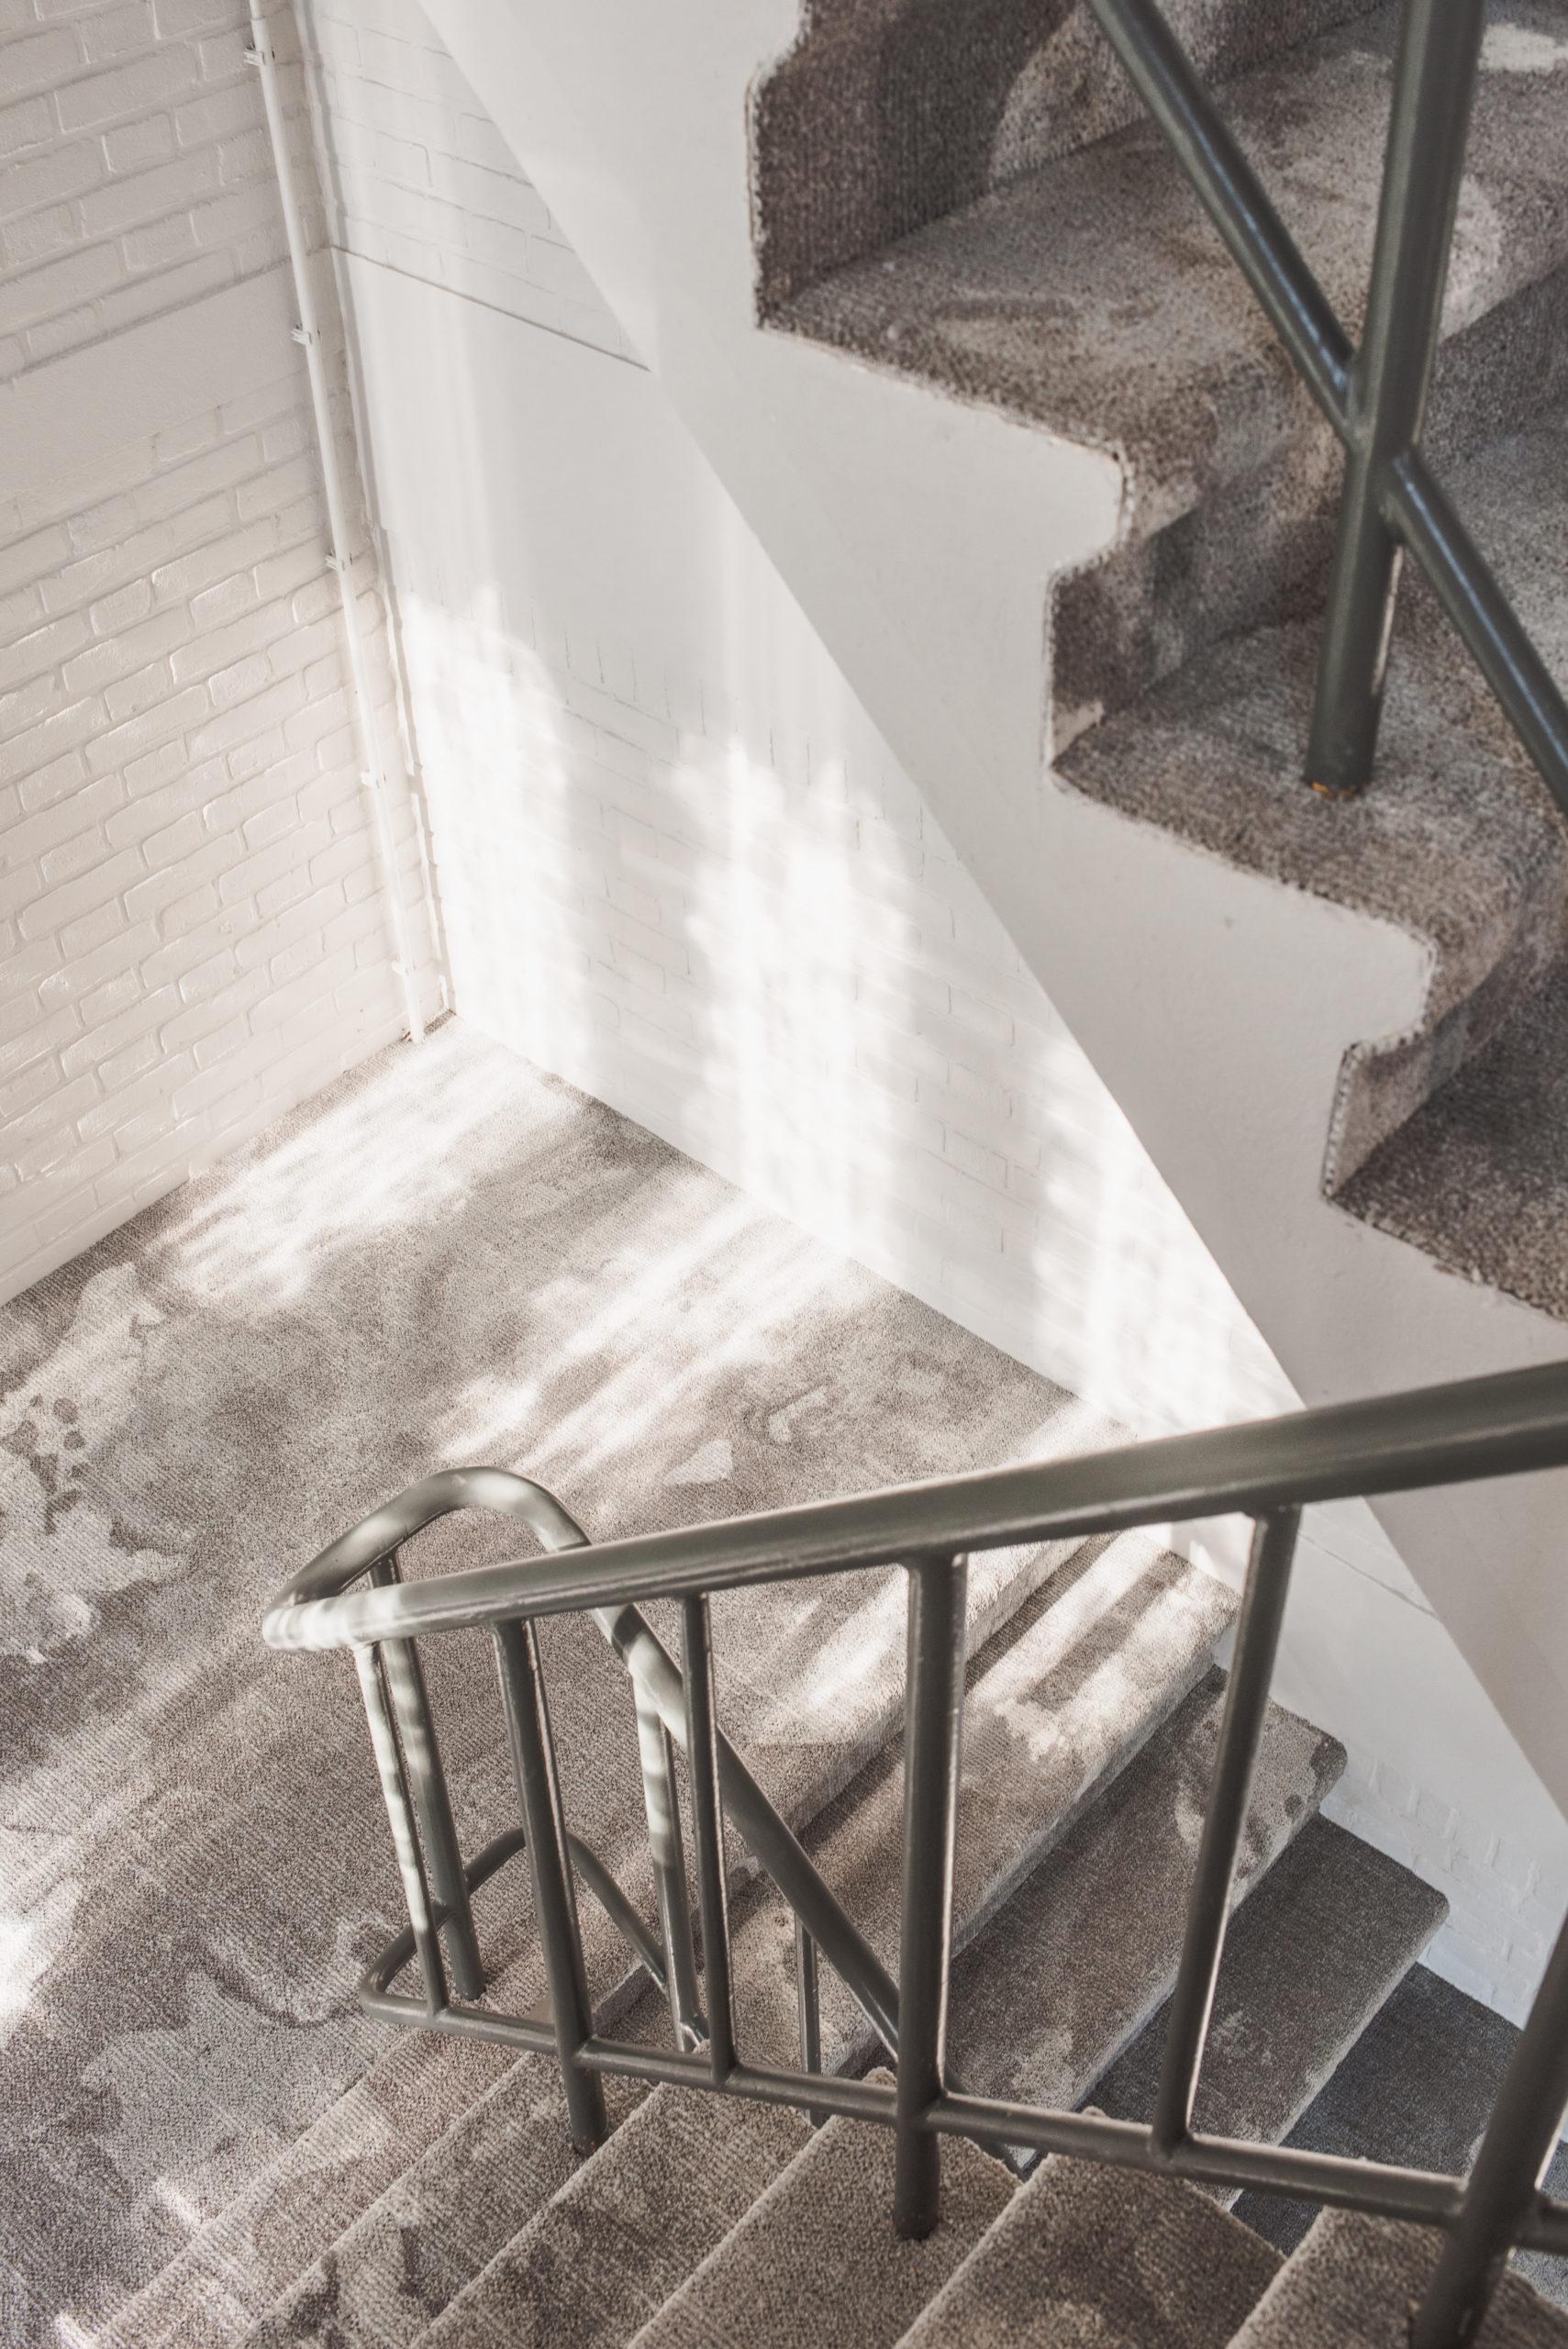 Oceans Haarlem - Locatie Interieur - 20200915 - Cindy van Rees - HR - DSC_0464